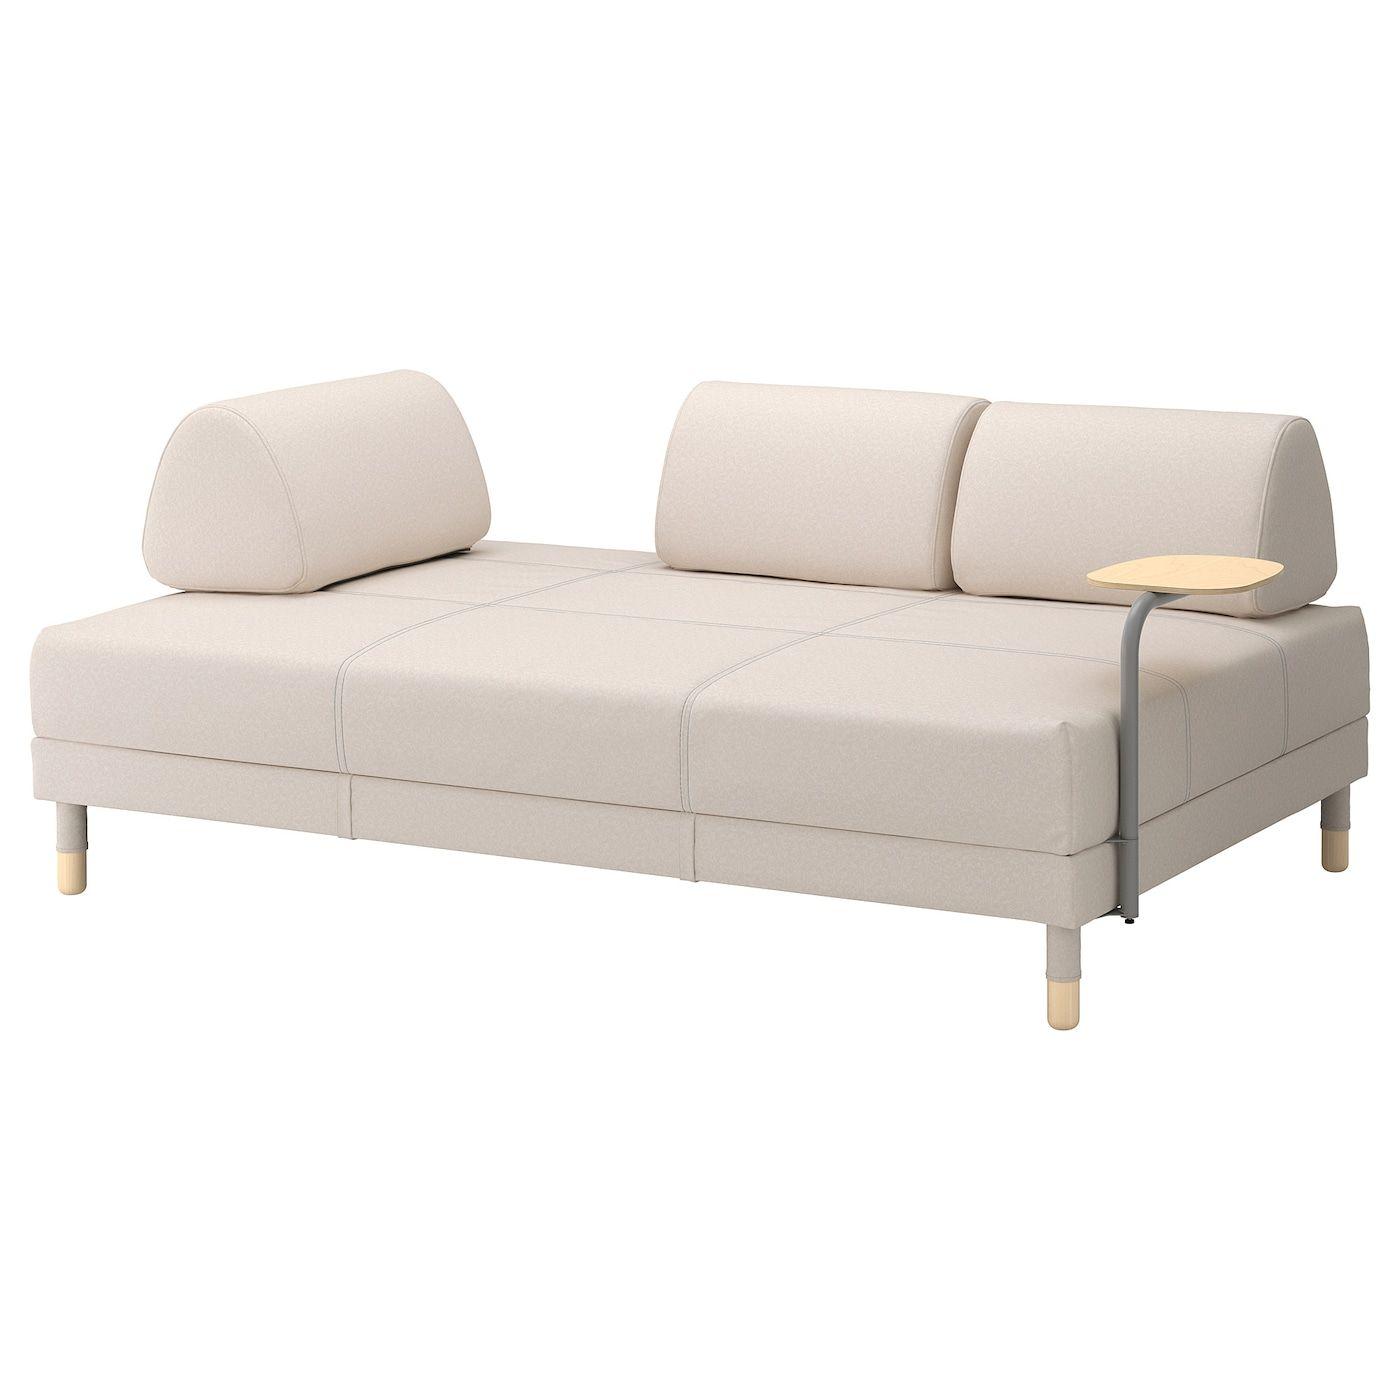 Cool Flottebo Sleeper Sofa With Side Table Lofallet Beige In Ibusinesslaw Wood Chair Design Ideas Ibusinesslaworg